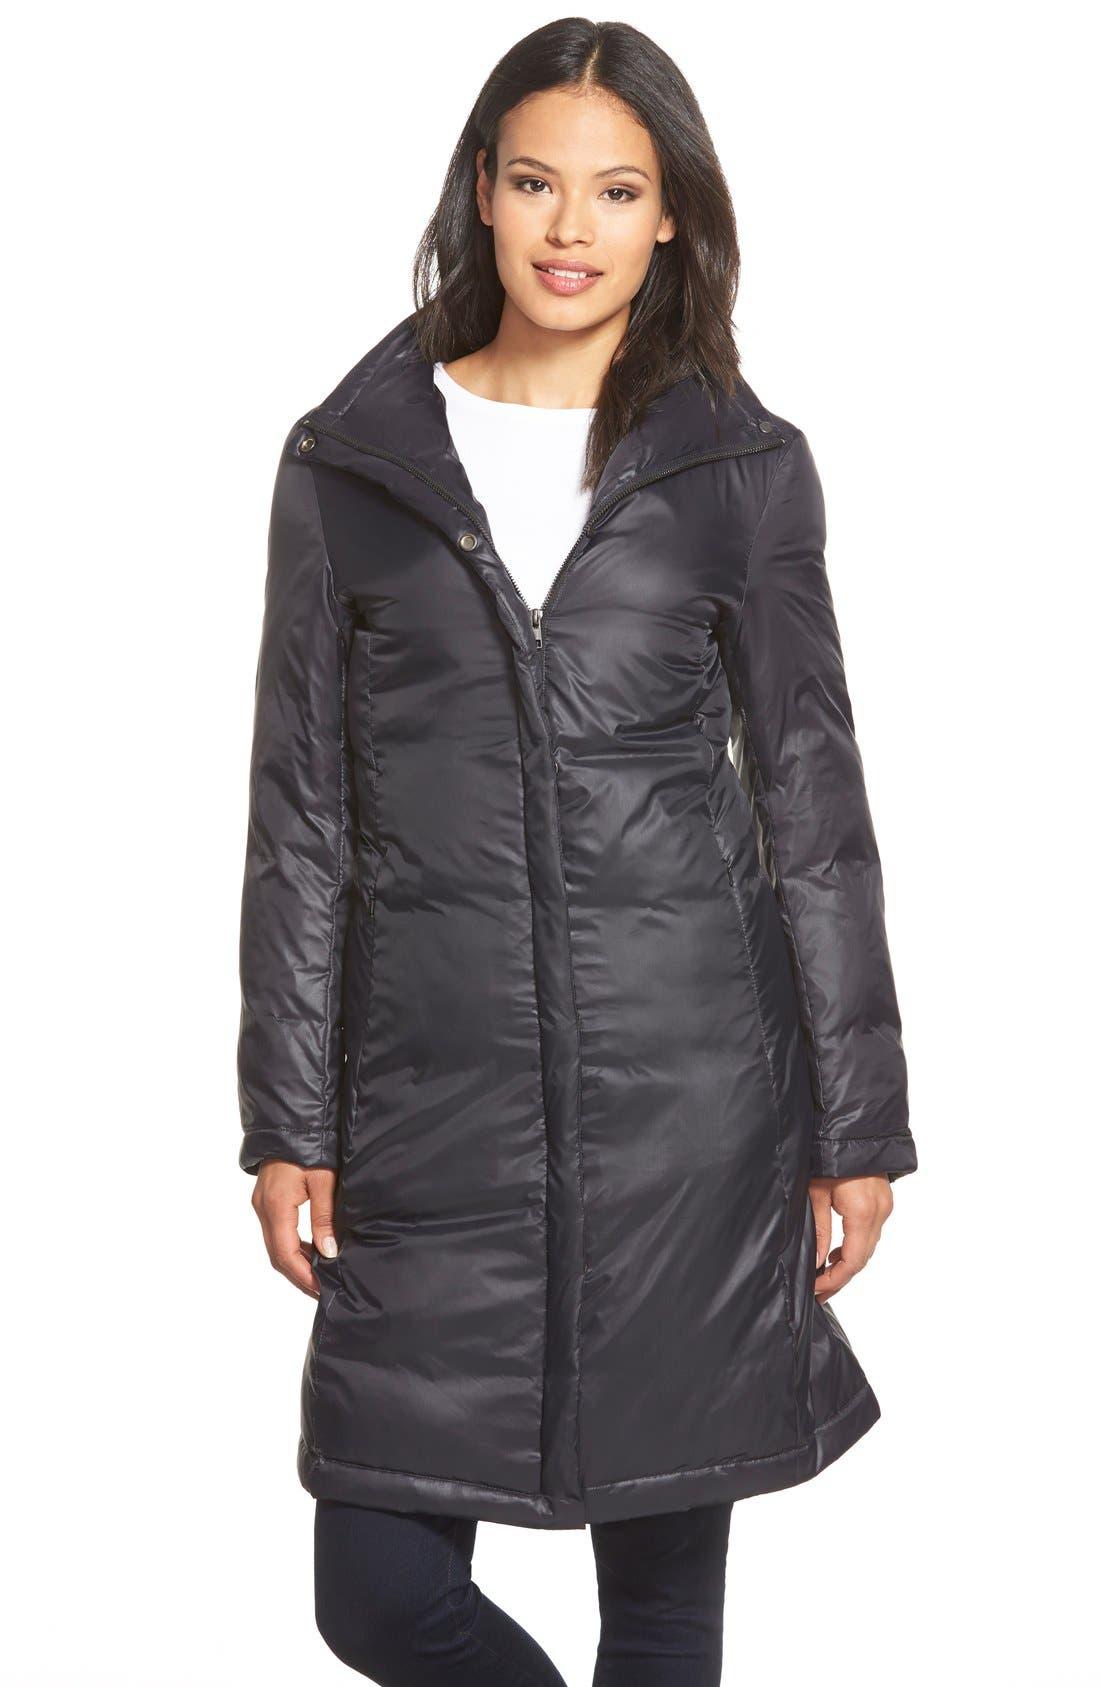 Alternate Image 1 Selected - Eileen Fisher Stand Collar Down Puffer Jacket (Regular & Petite)